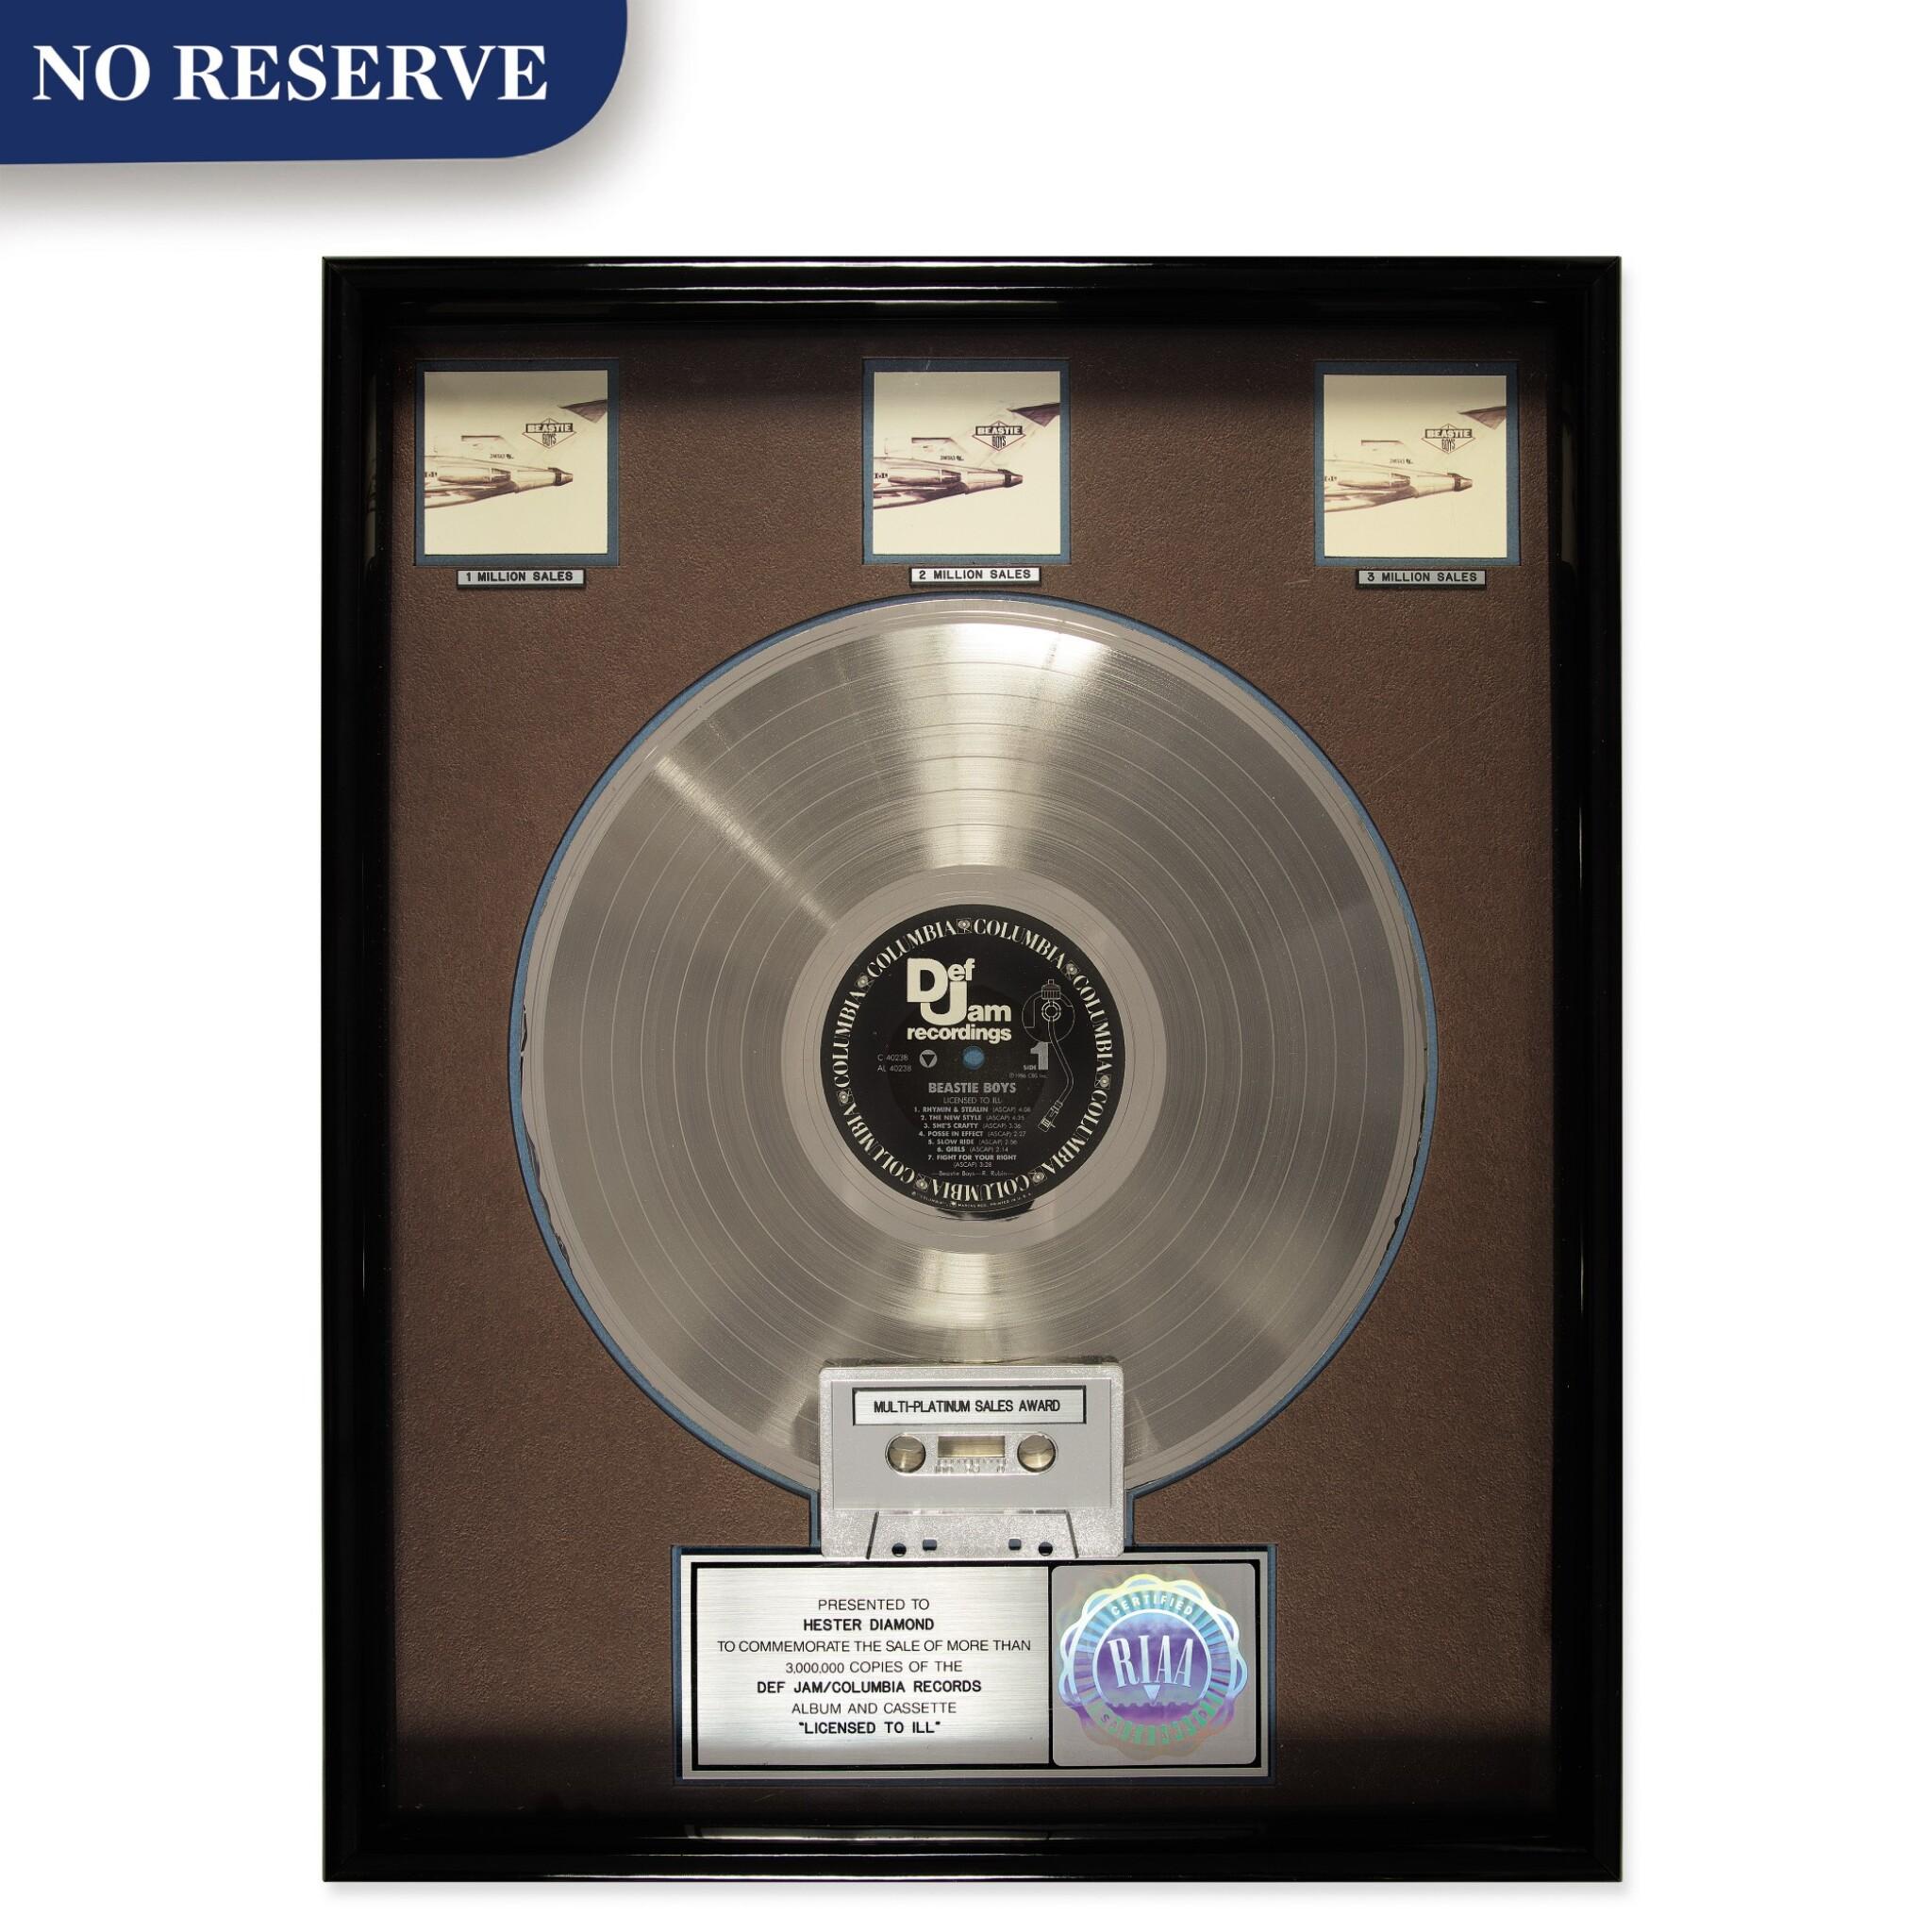 "RIAA Multi-Platinum Diamond sales award presented to Hester Diamond for the Beastie Boys 1986 album ""Licensed to Ill"""